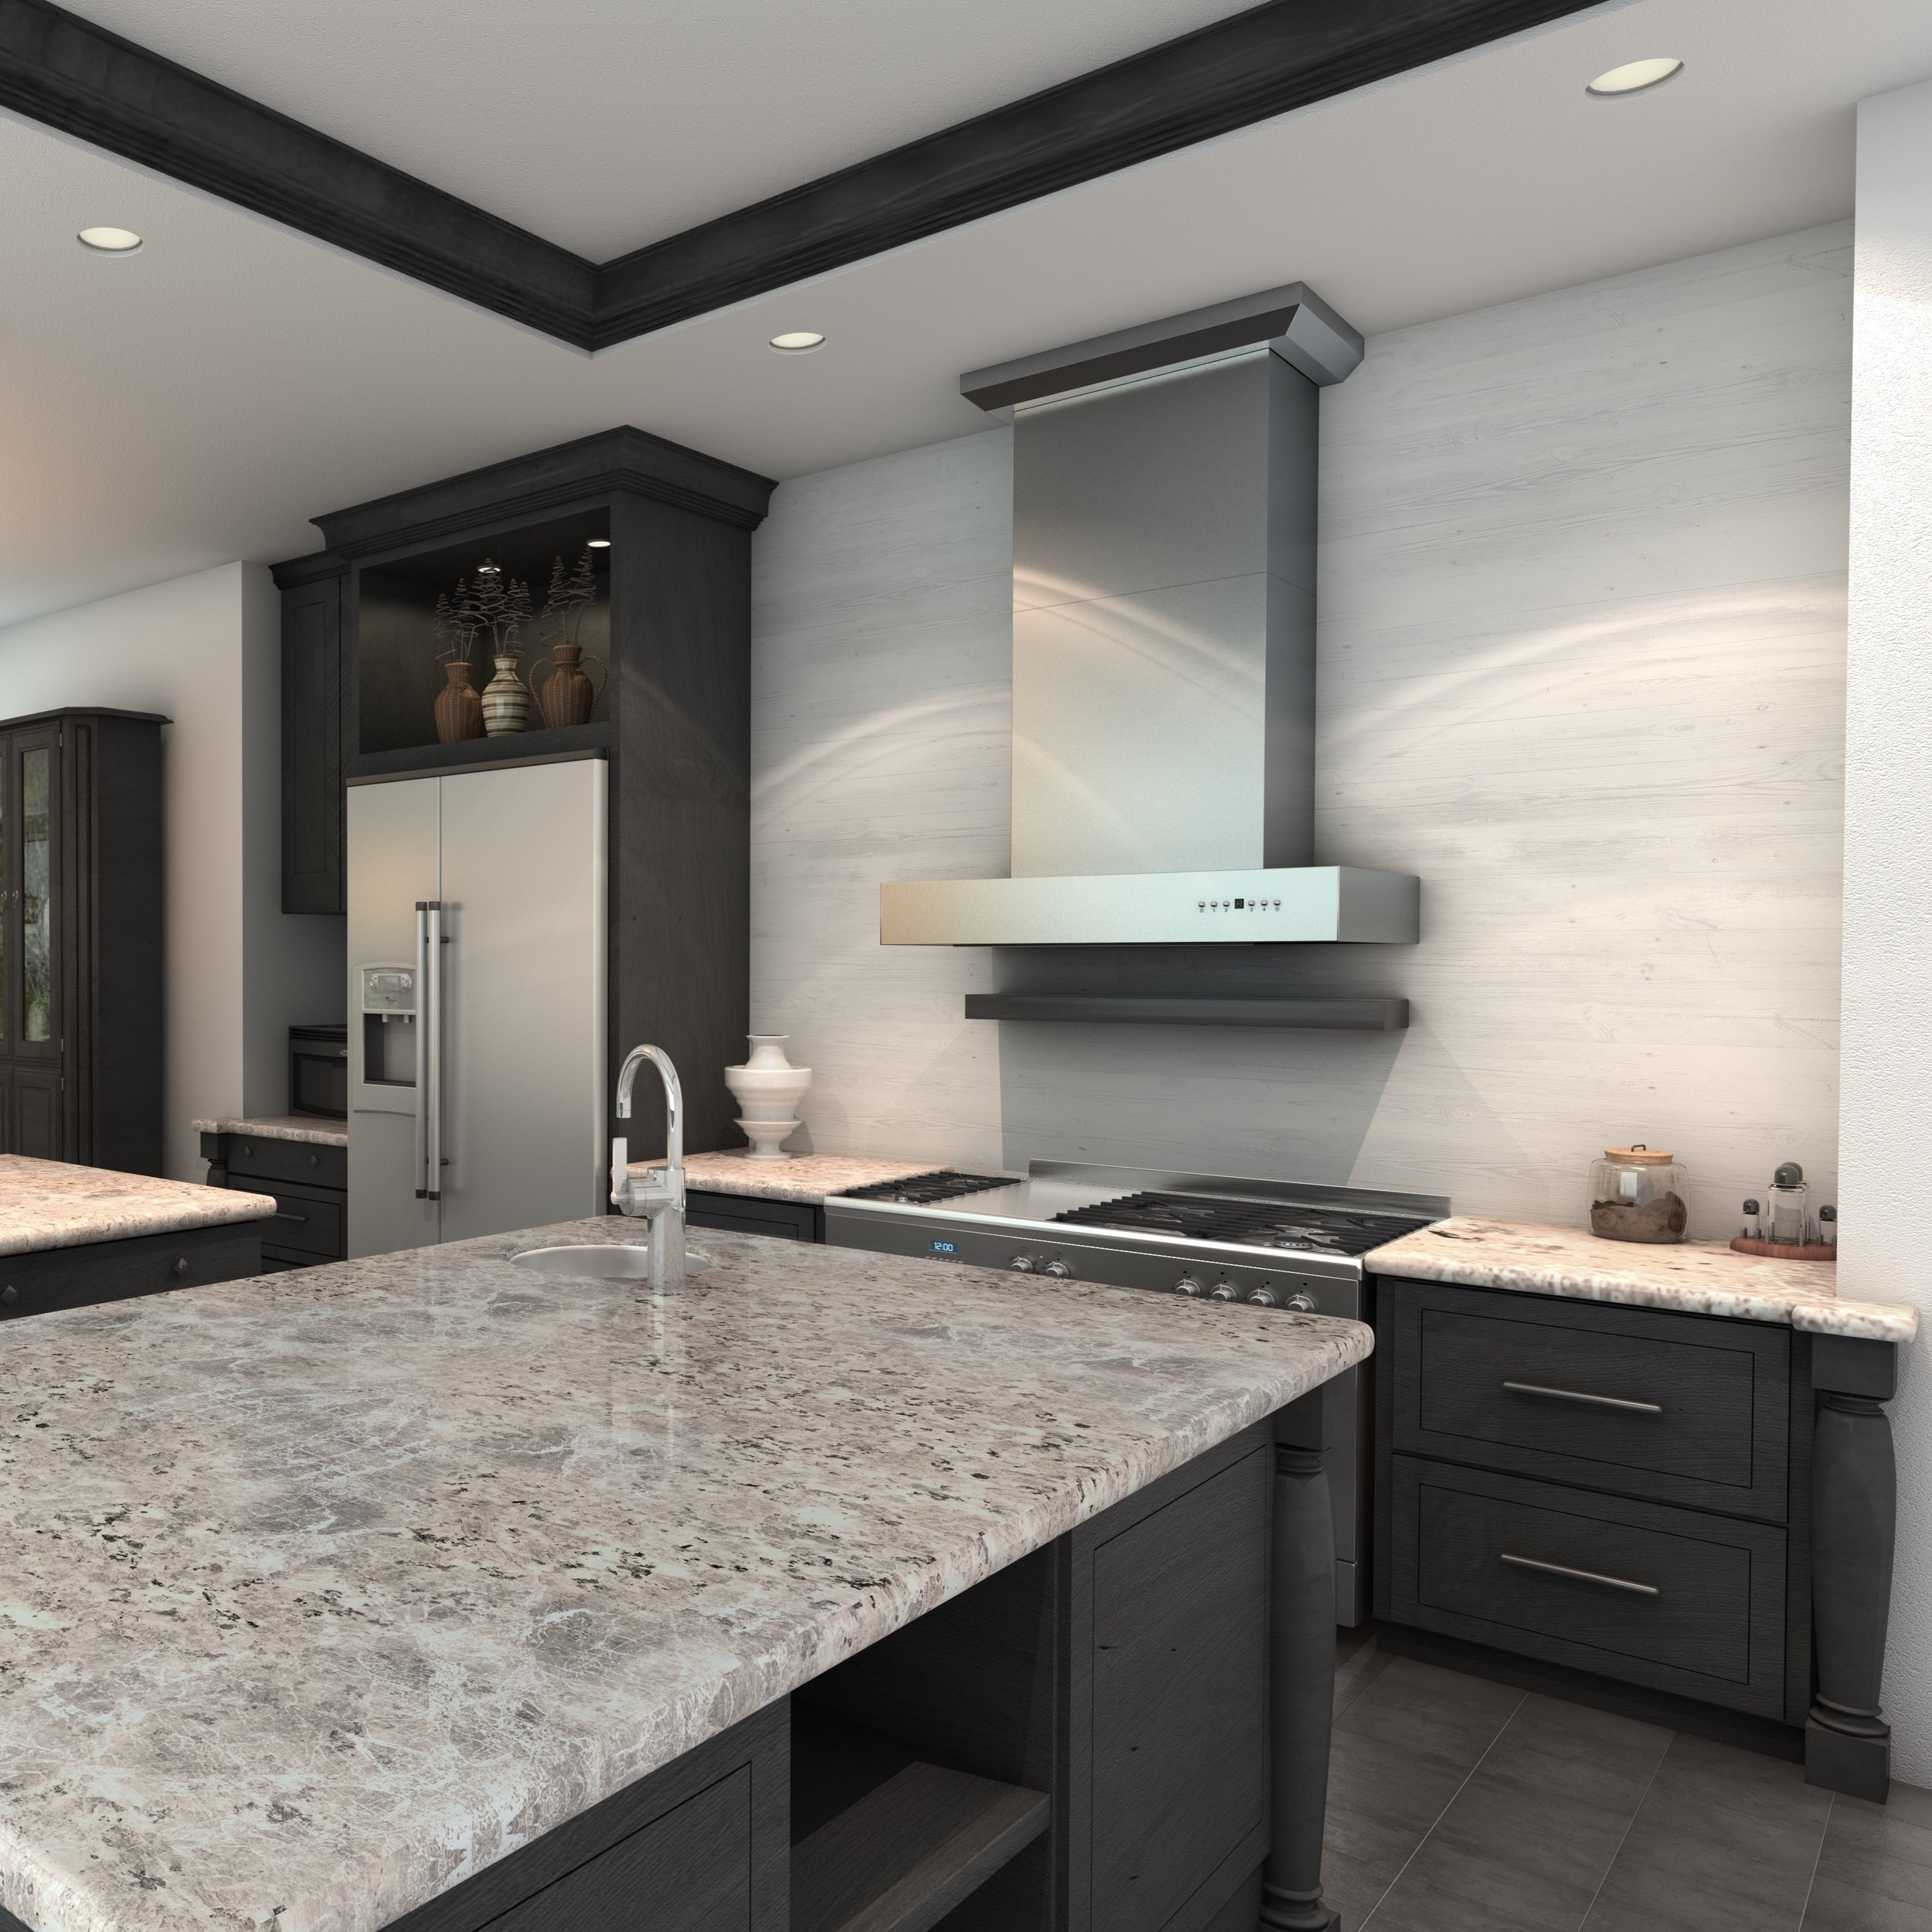 zline-stainless-steel-wall-mounted-range-hood-KECOM-kitchen 3.jpeg